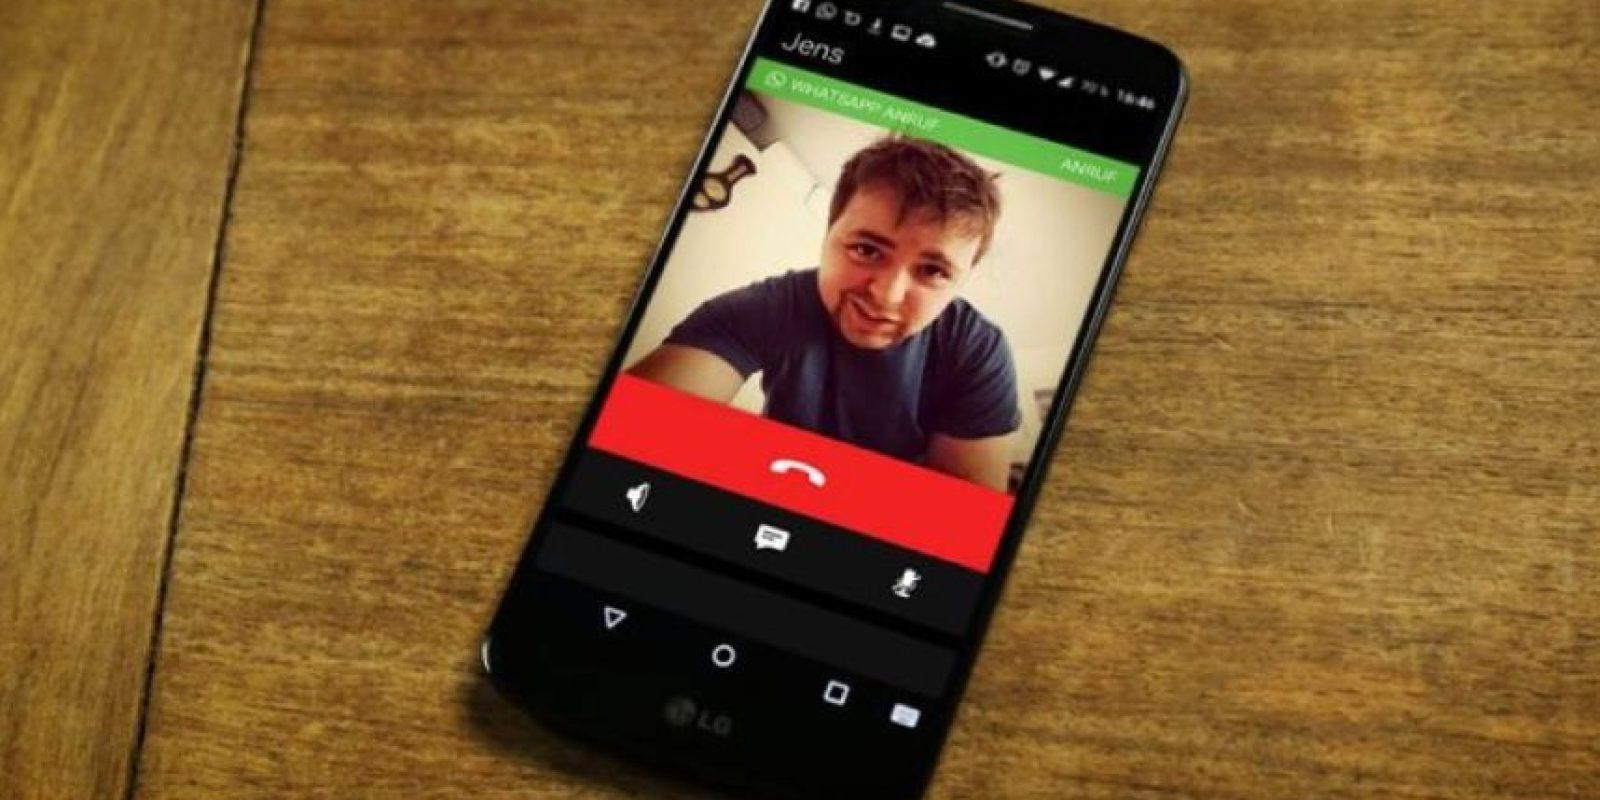 Las llamadas gratis en WhatsApp son un objeto de estafas. Foto:Pinterest